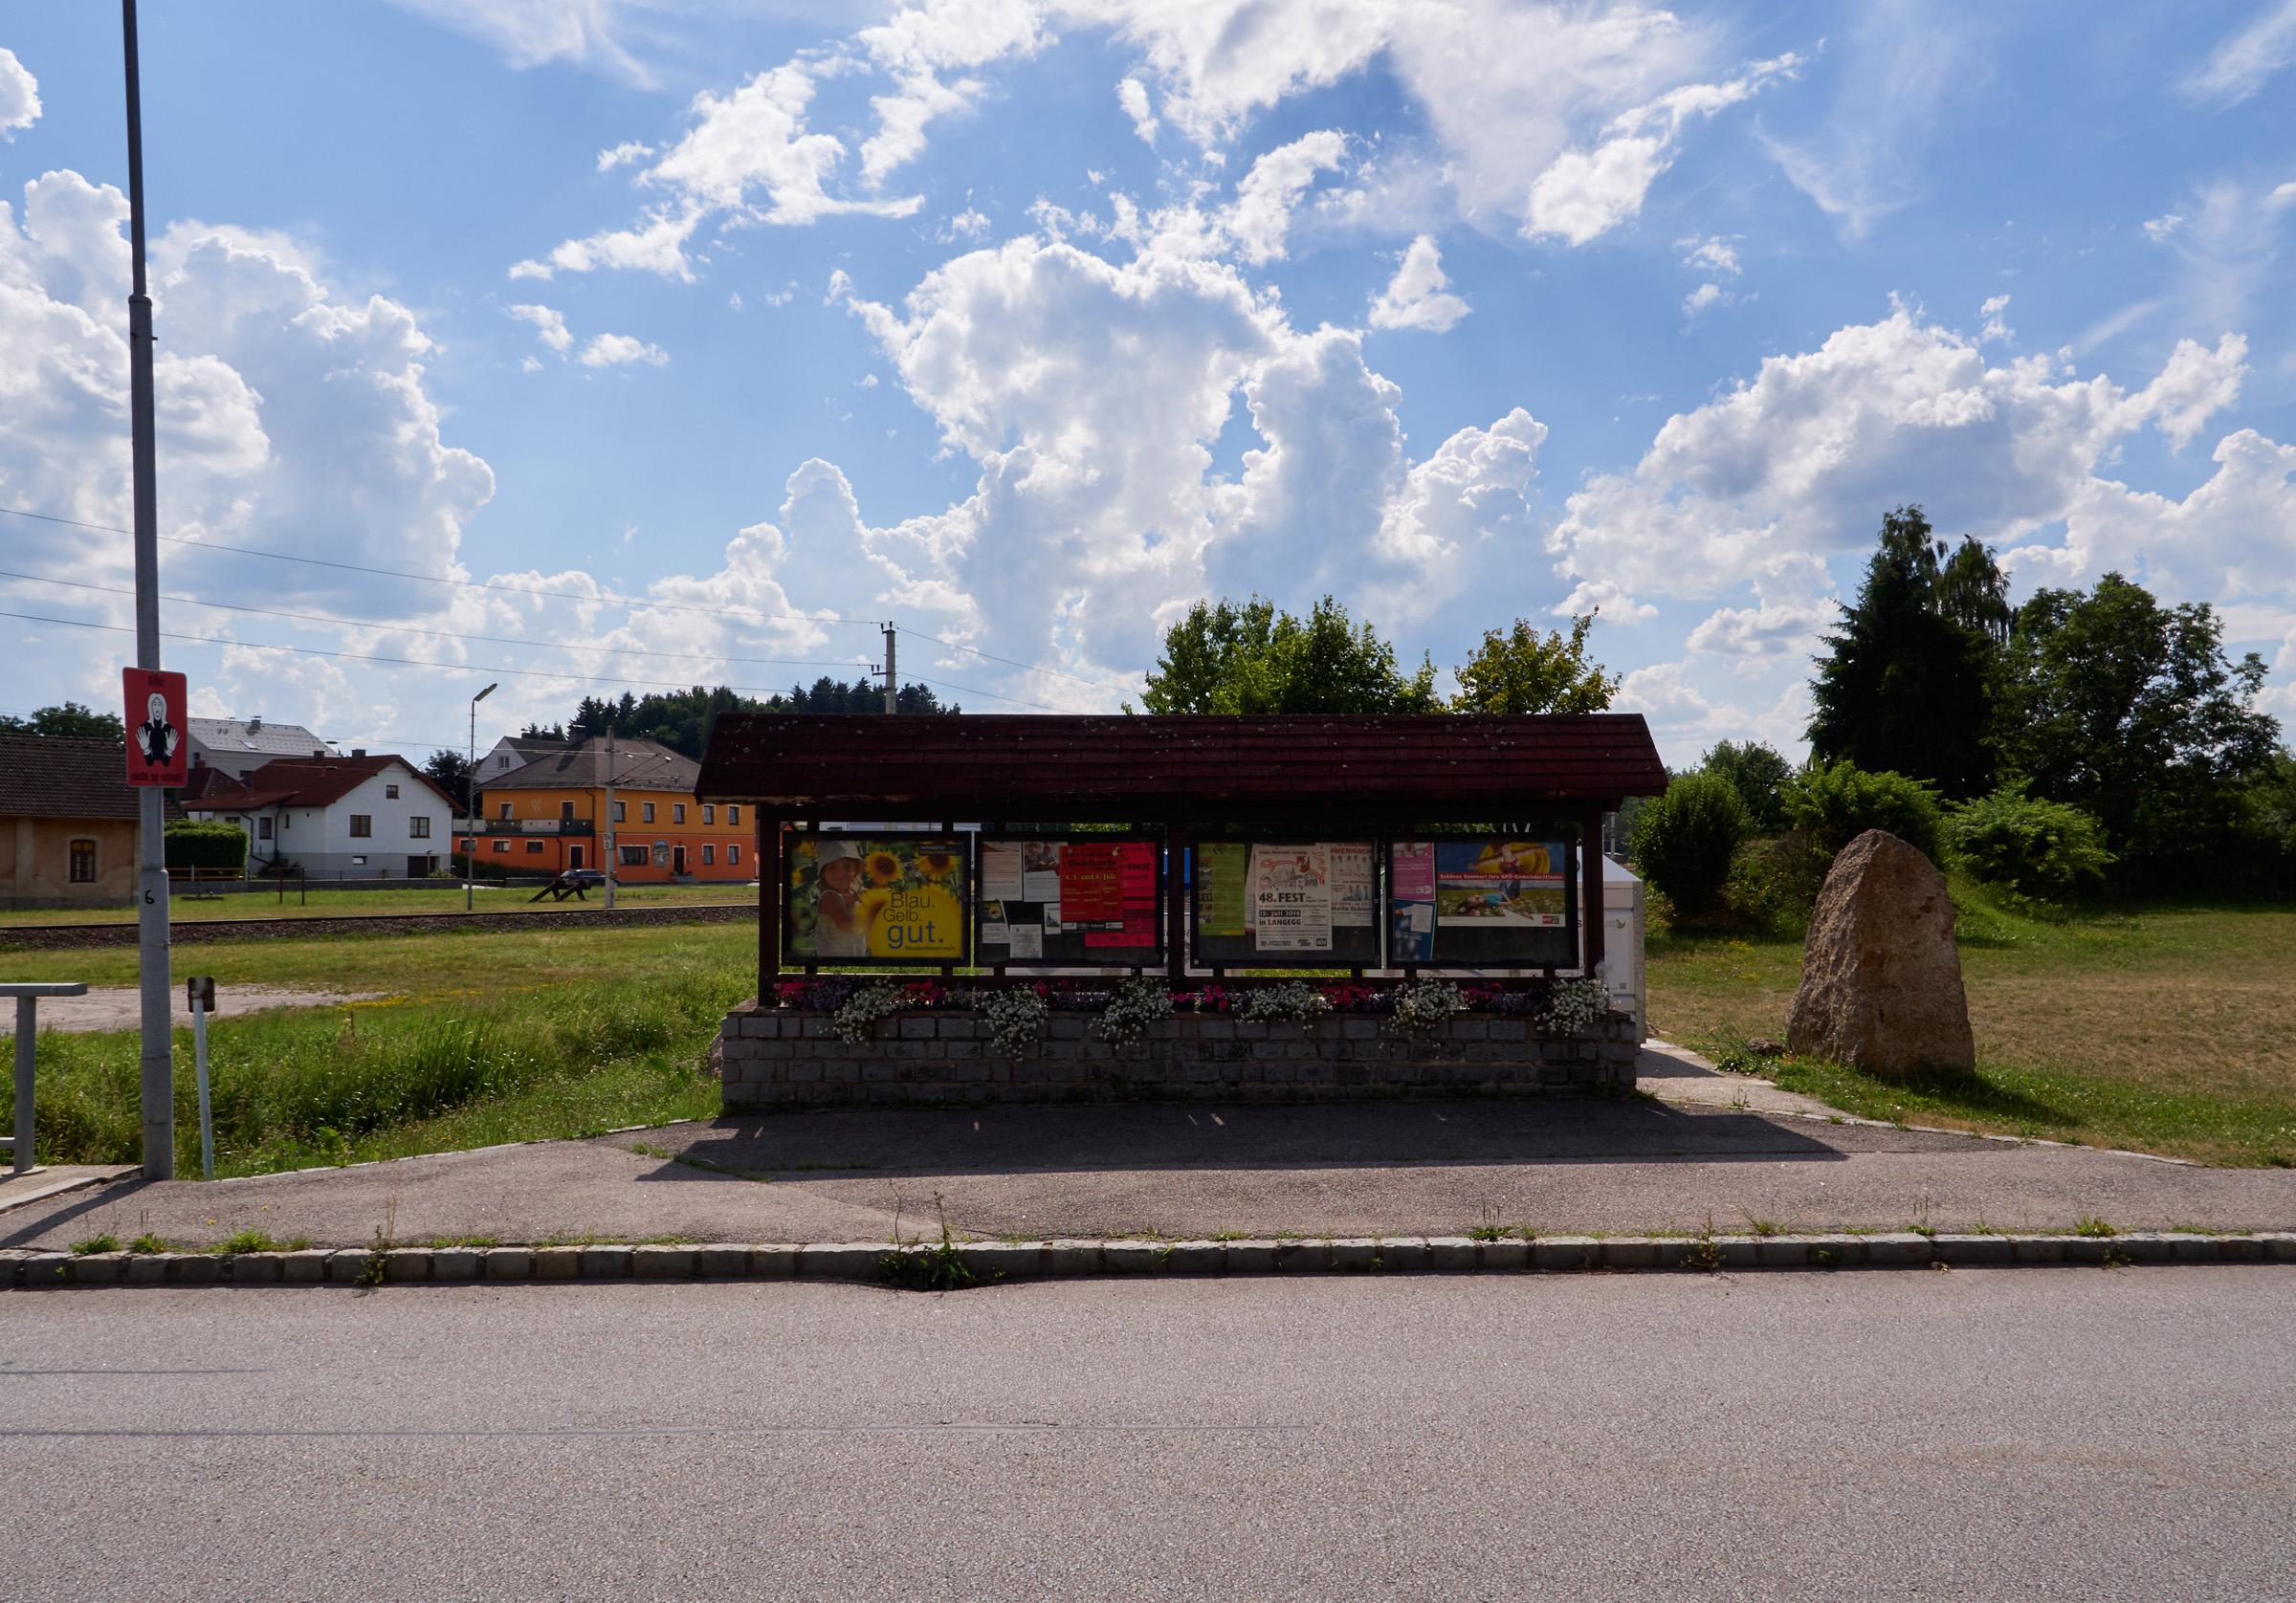 Pürbach weit 2014-07-07.jpg